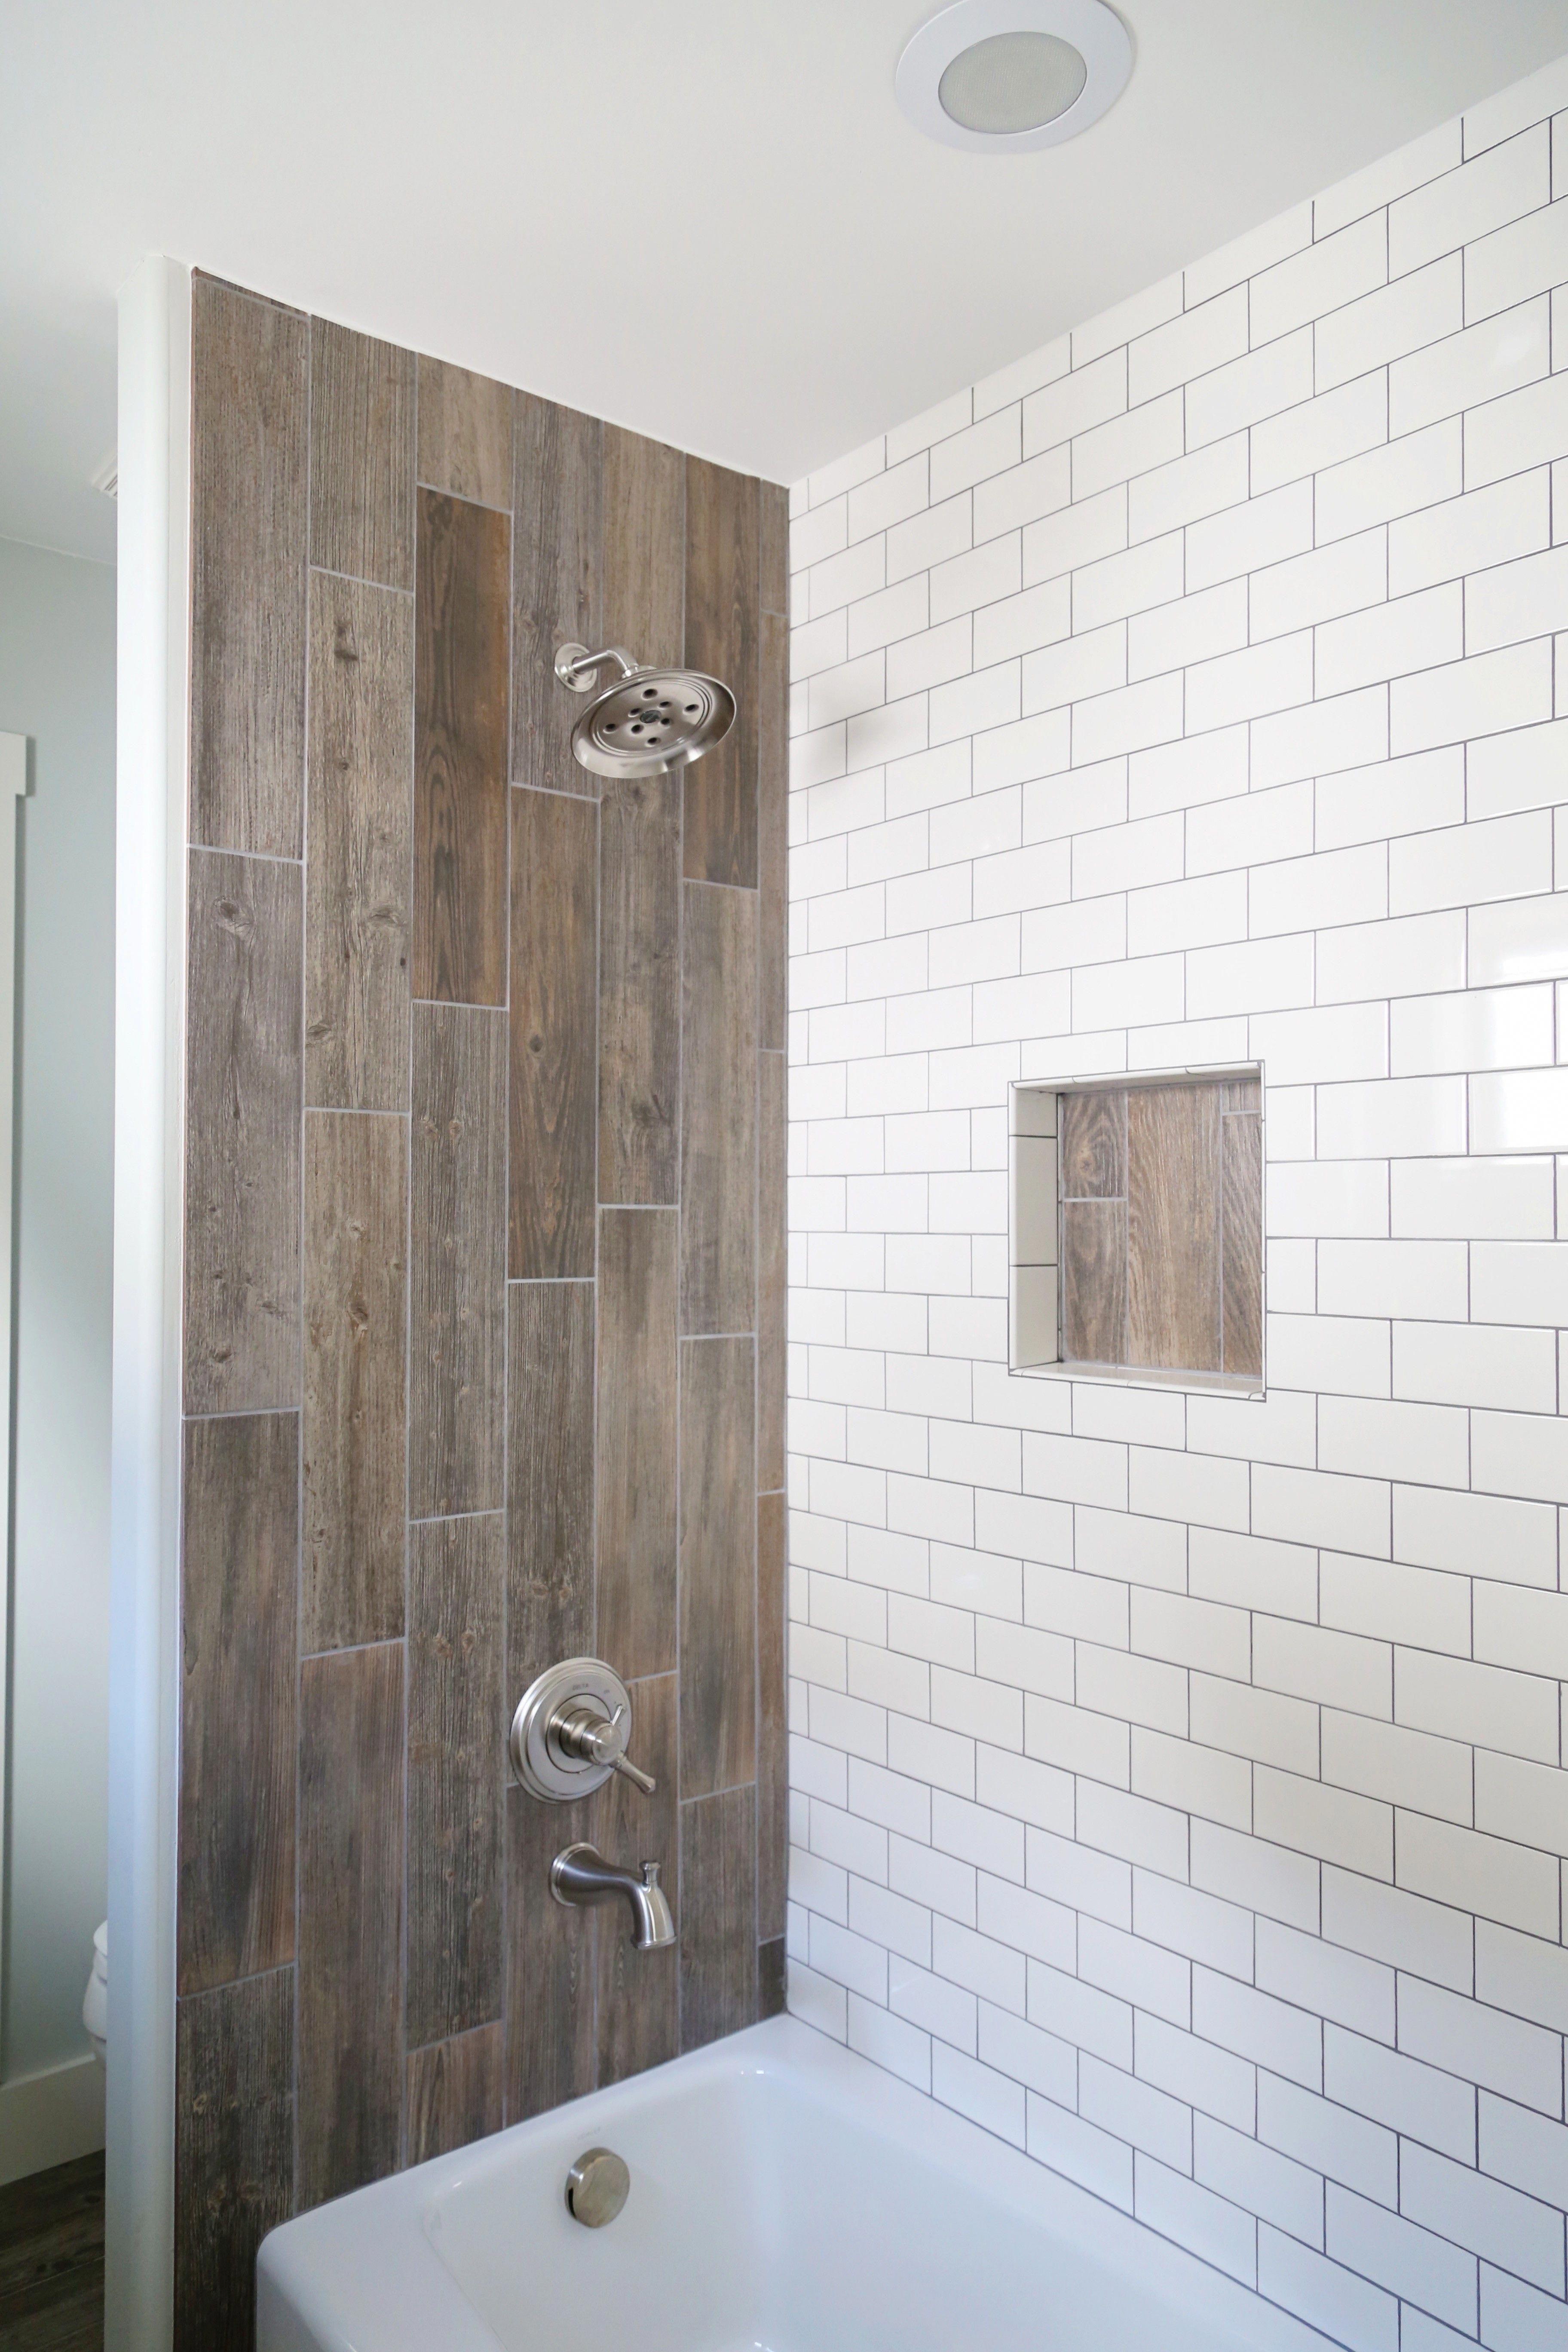 Jack And Jill Bathroom Renovation Using Yellow Duk For Easy Shower Wall Insert Wood Grain Meets Tilin Wood Tile Shower Farmhouse Shower Bathroom Shower Tile